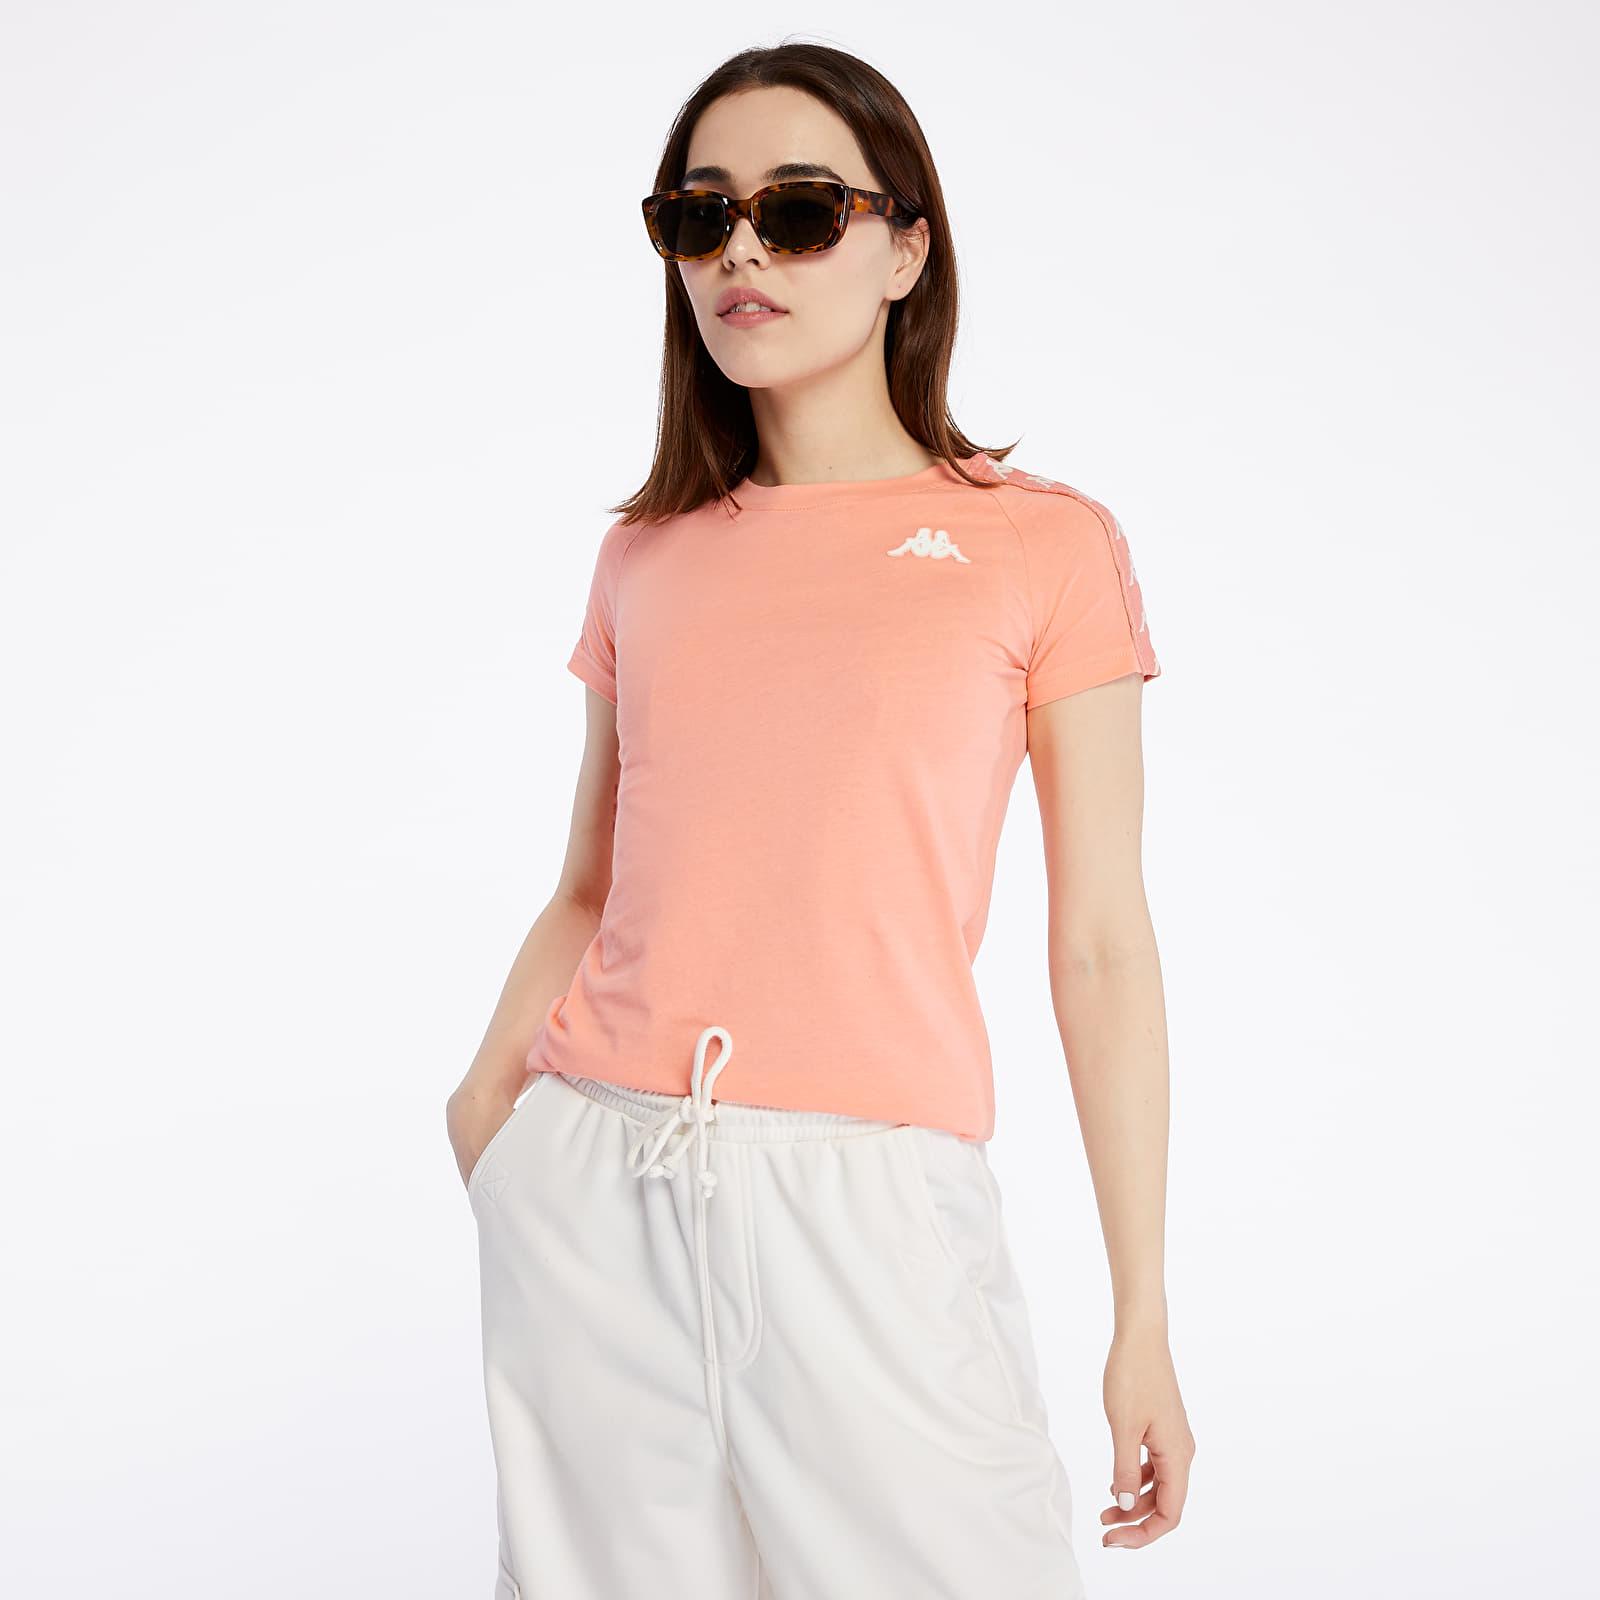 T-shirts Kappa 222 Banda Woen Tee Pink Peach/ White Antique